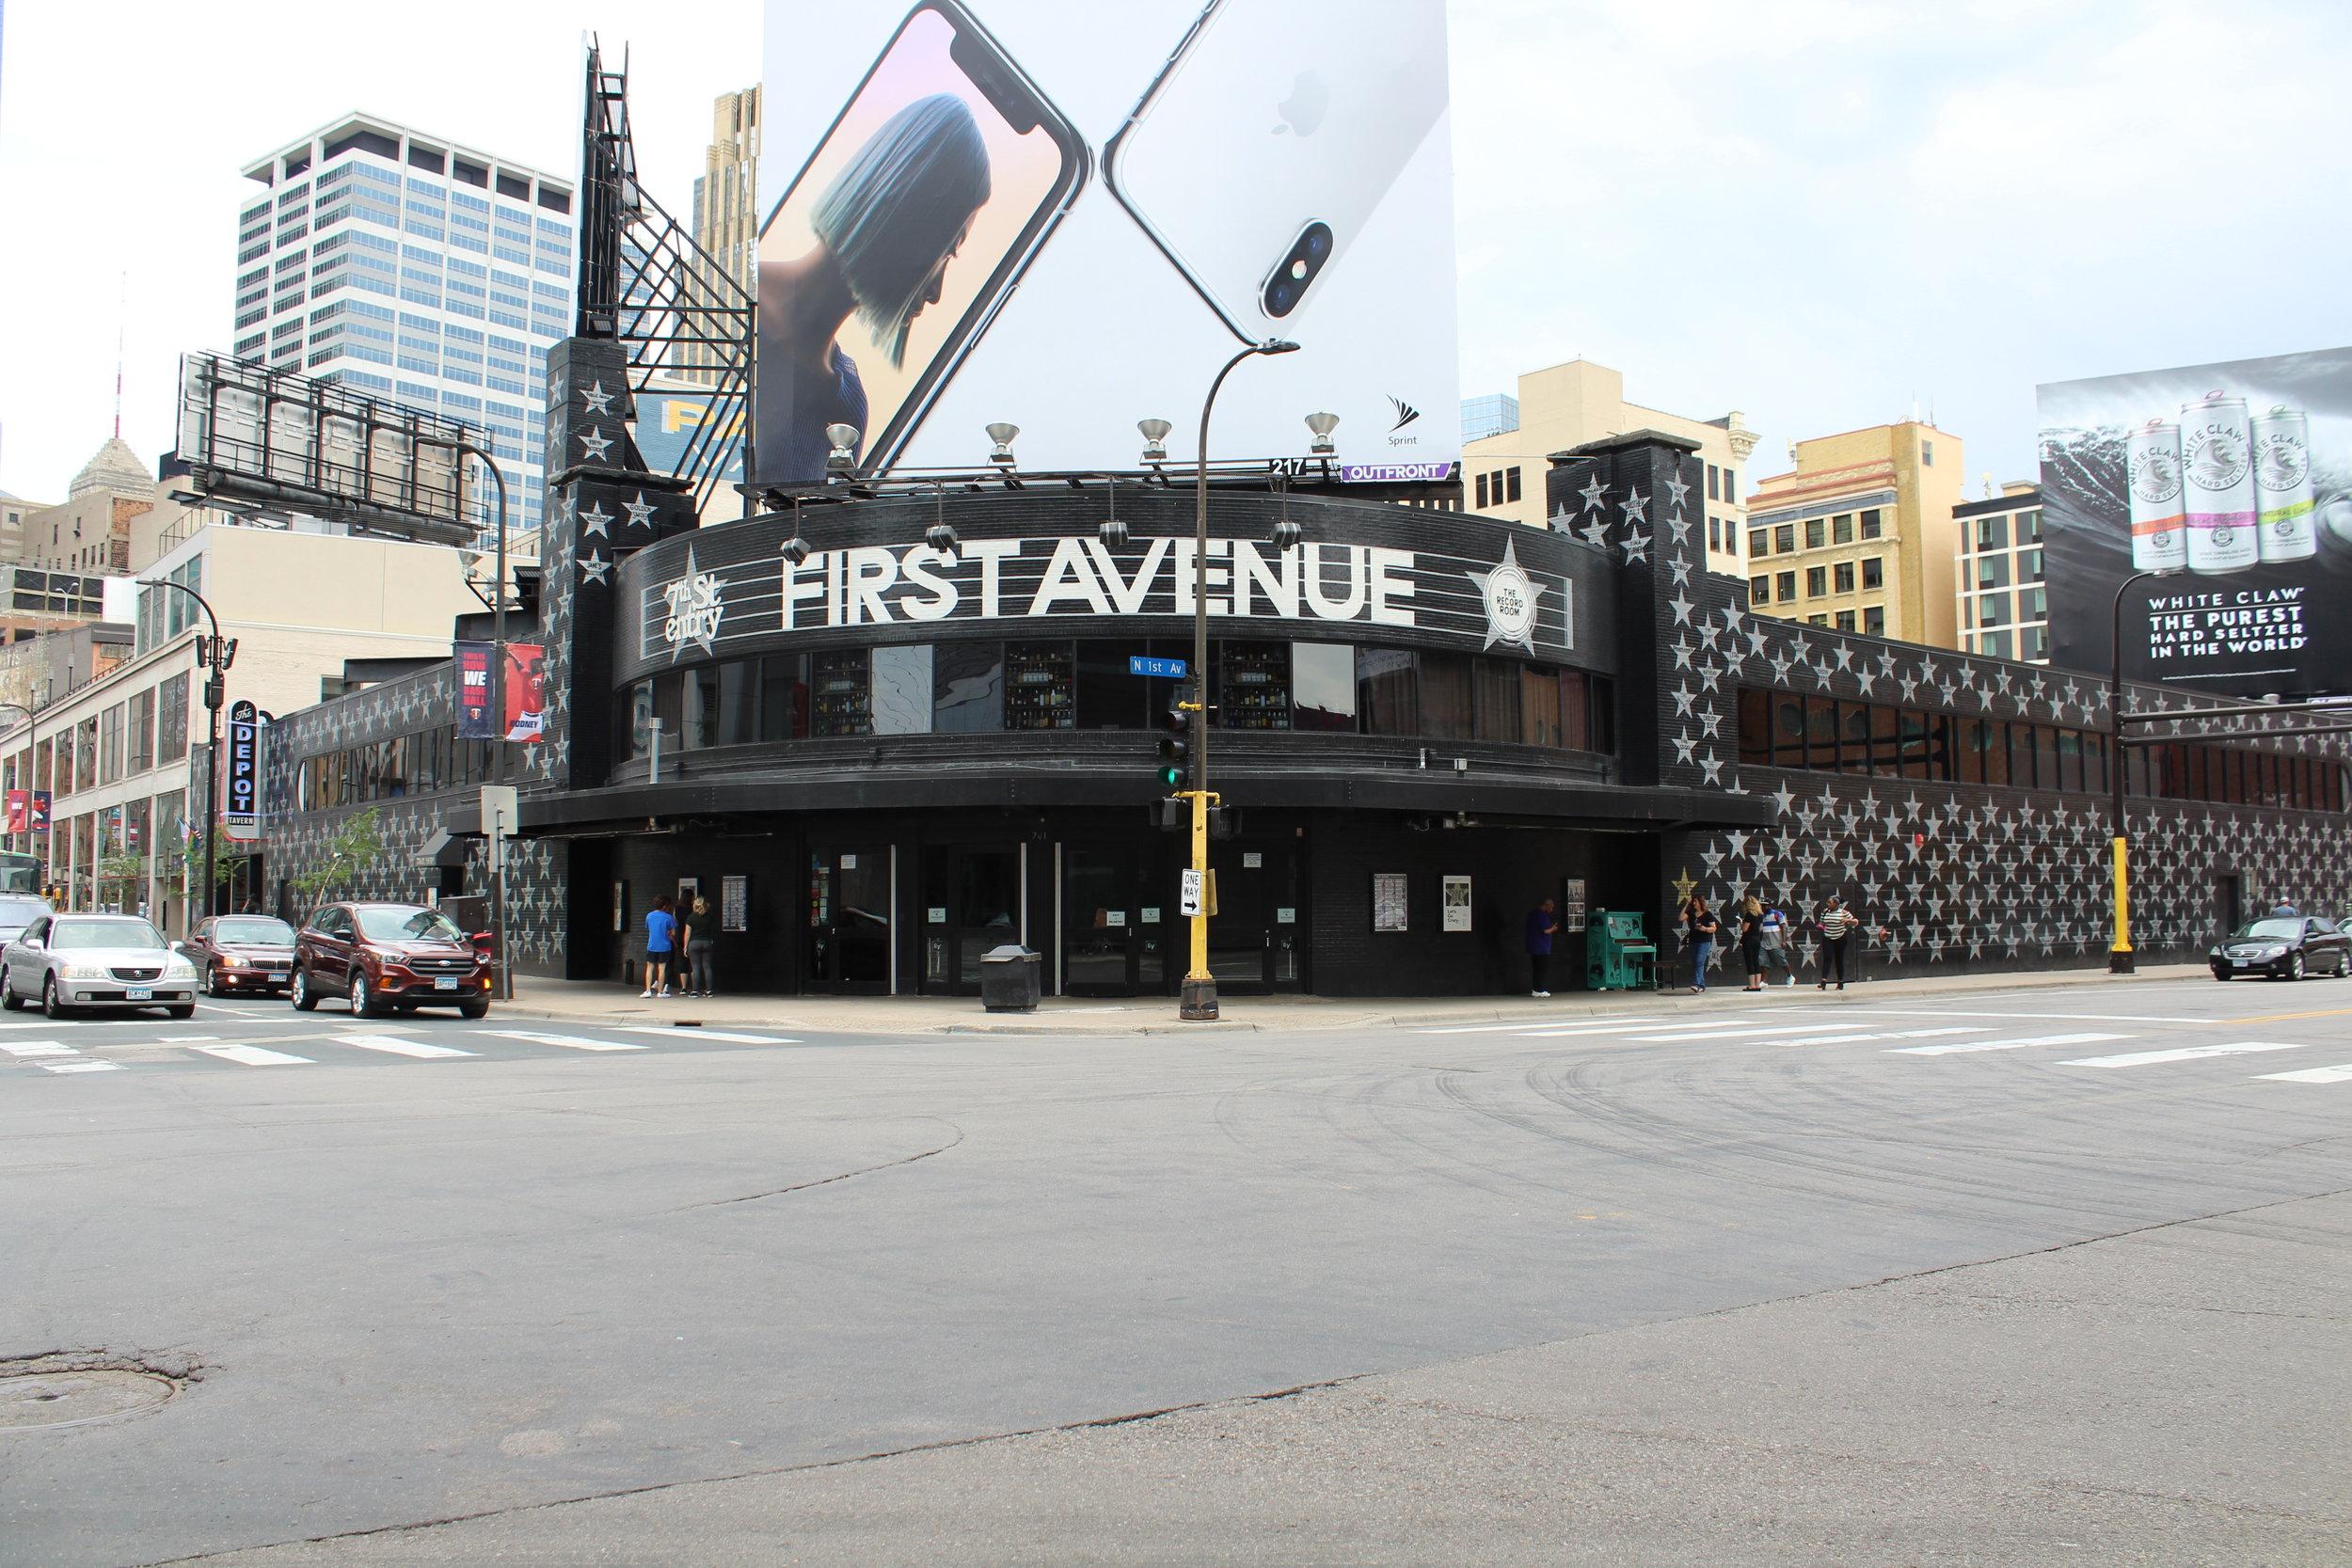 first_avenue1.JPG